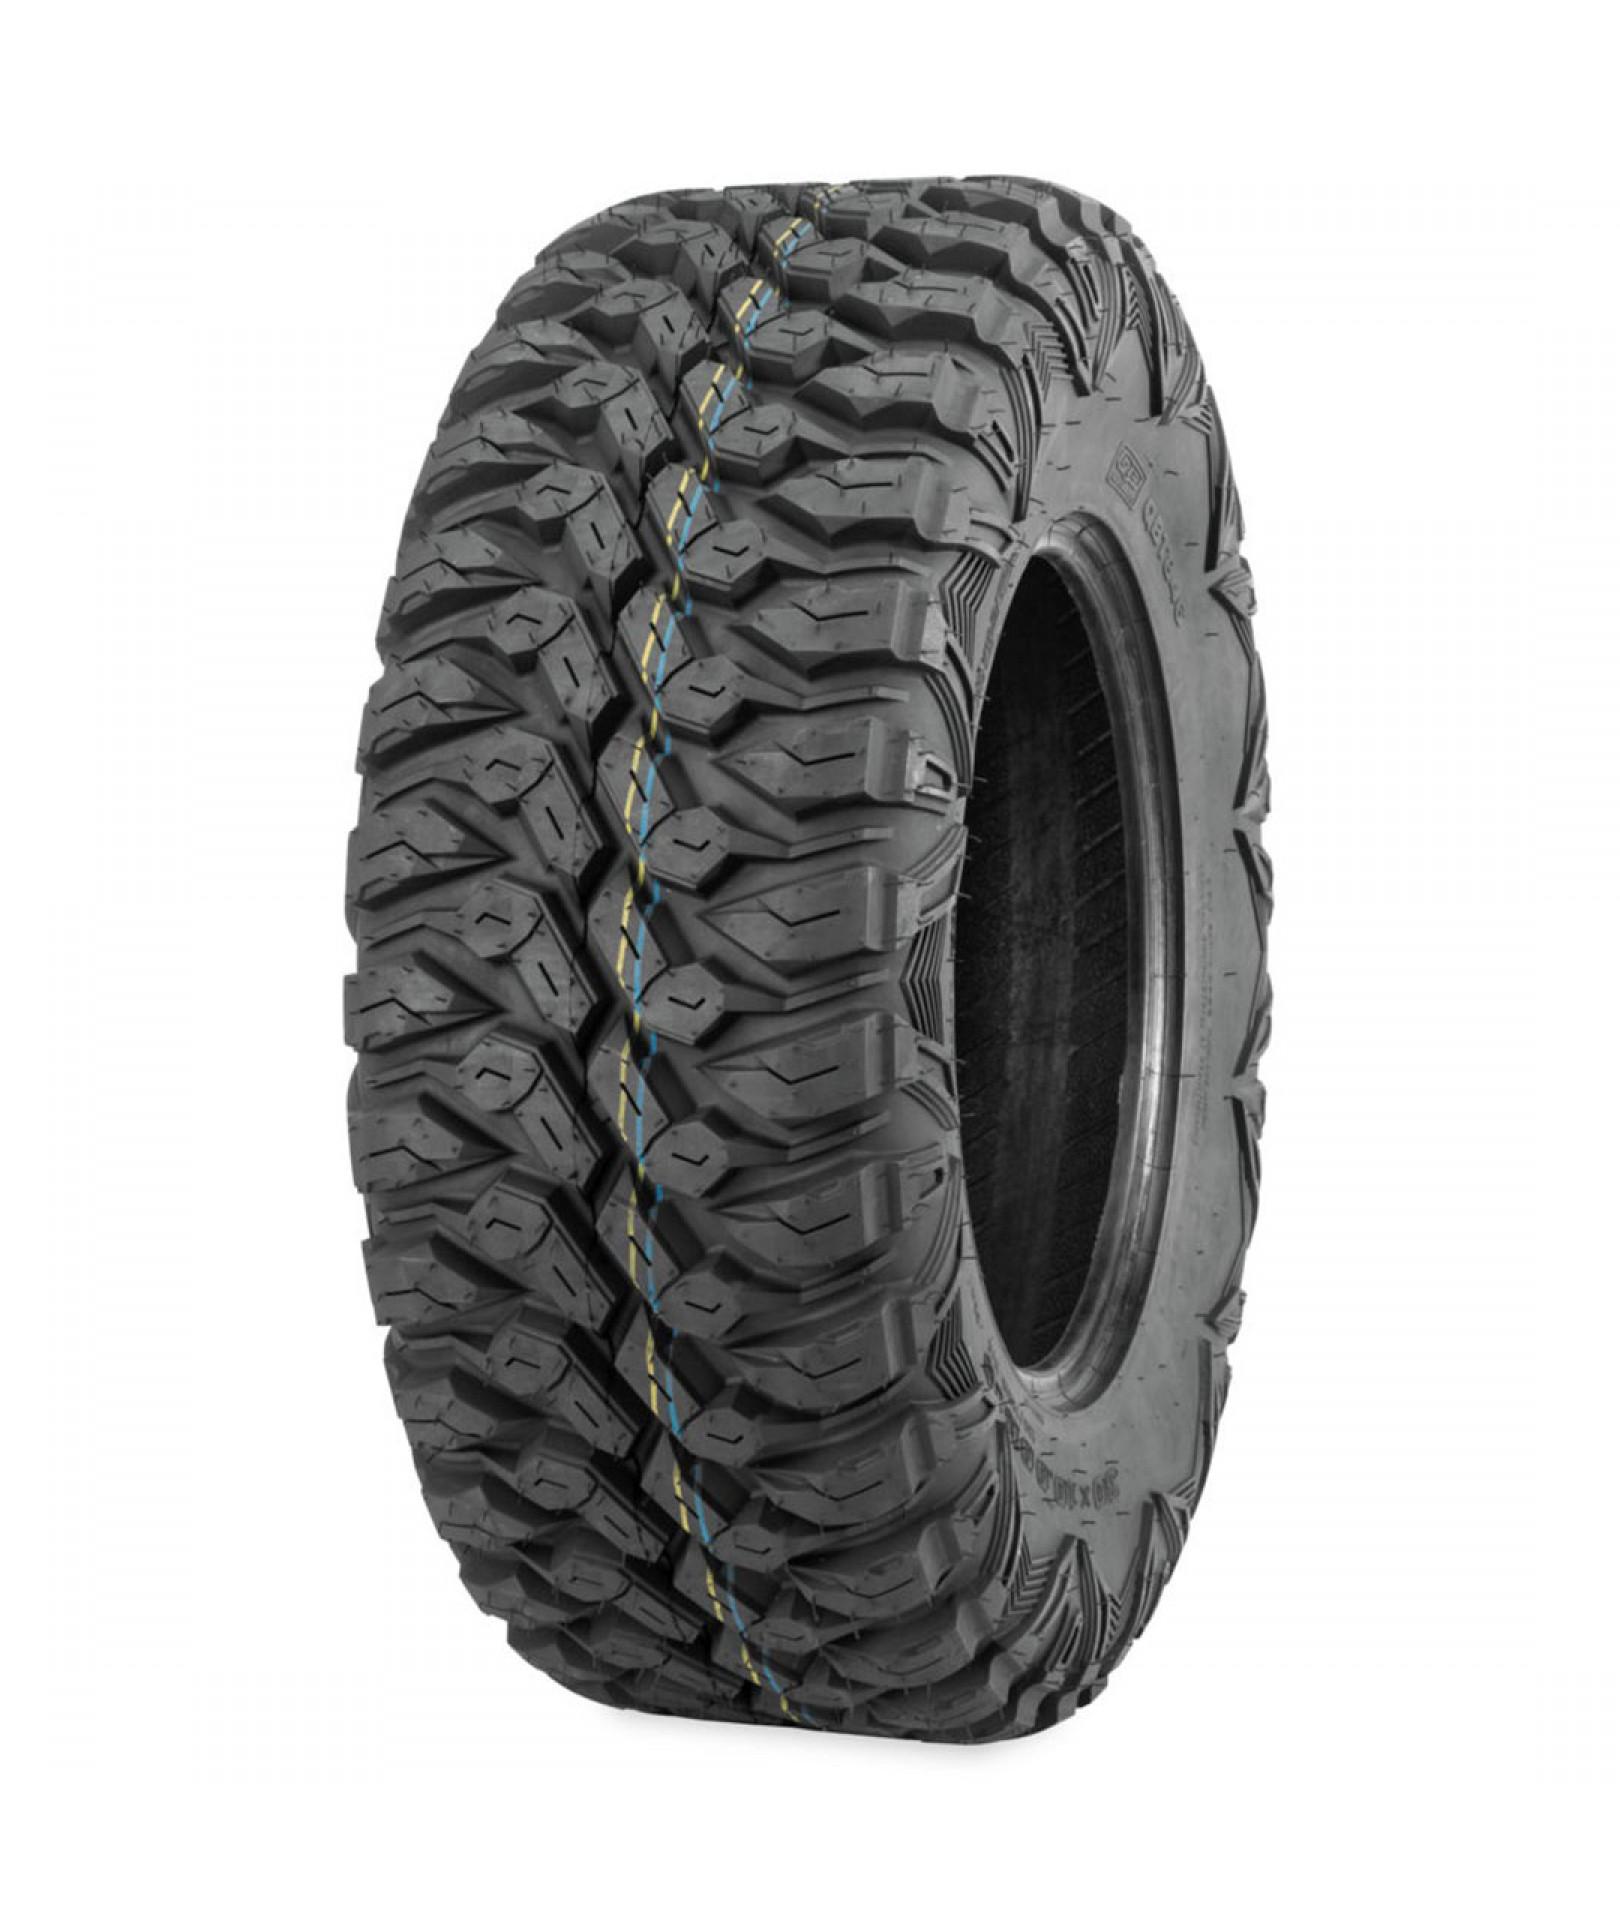 8ply 27x9-12 Pair of QuadBoss QBT446 Radial ATV Tires 2